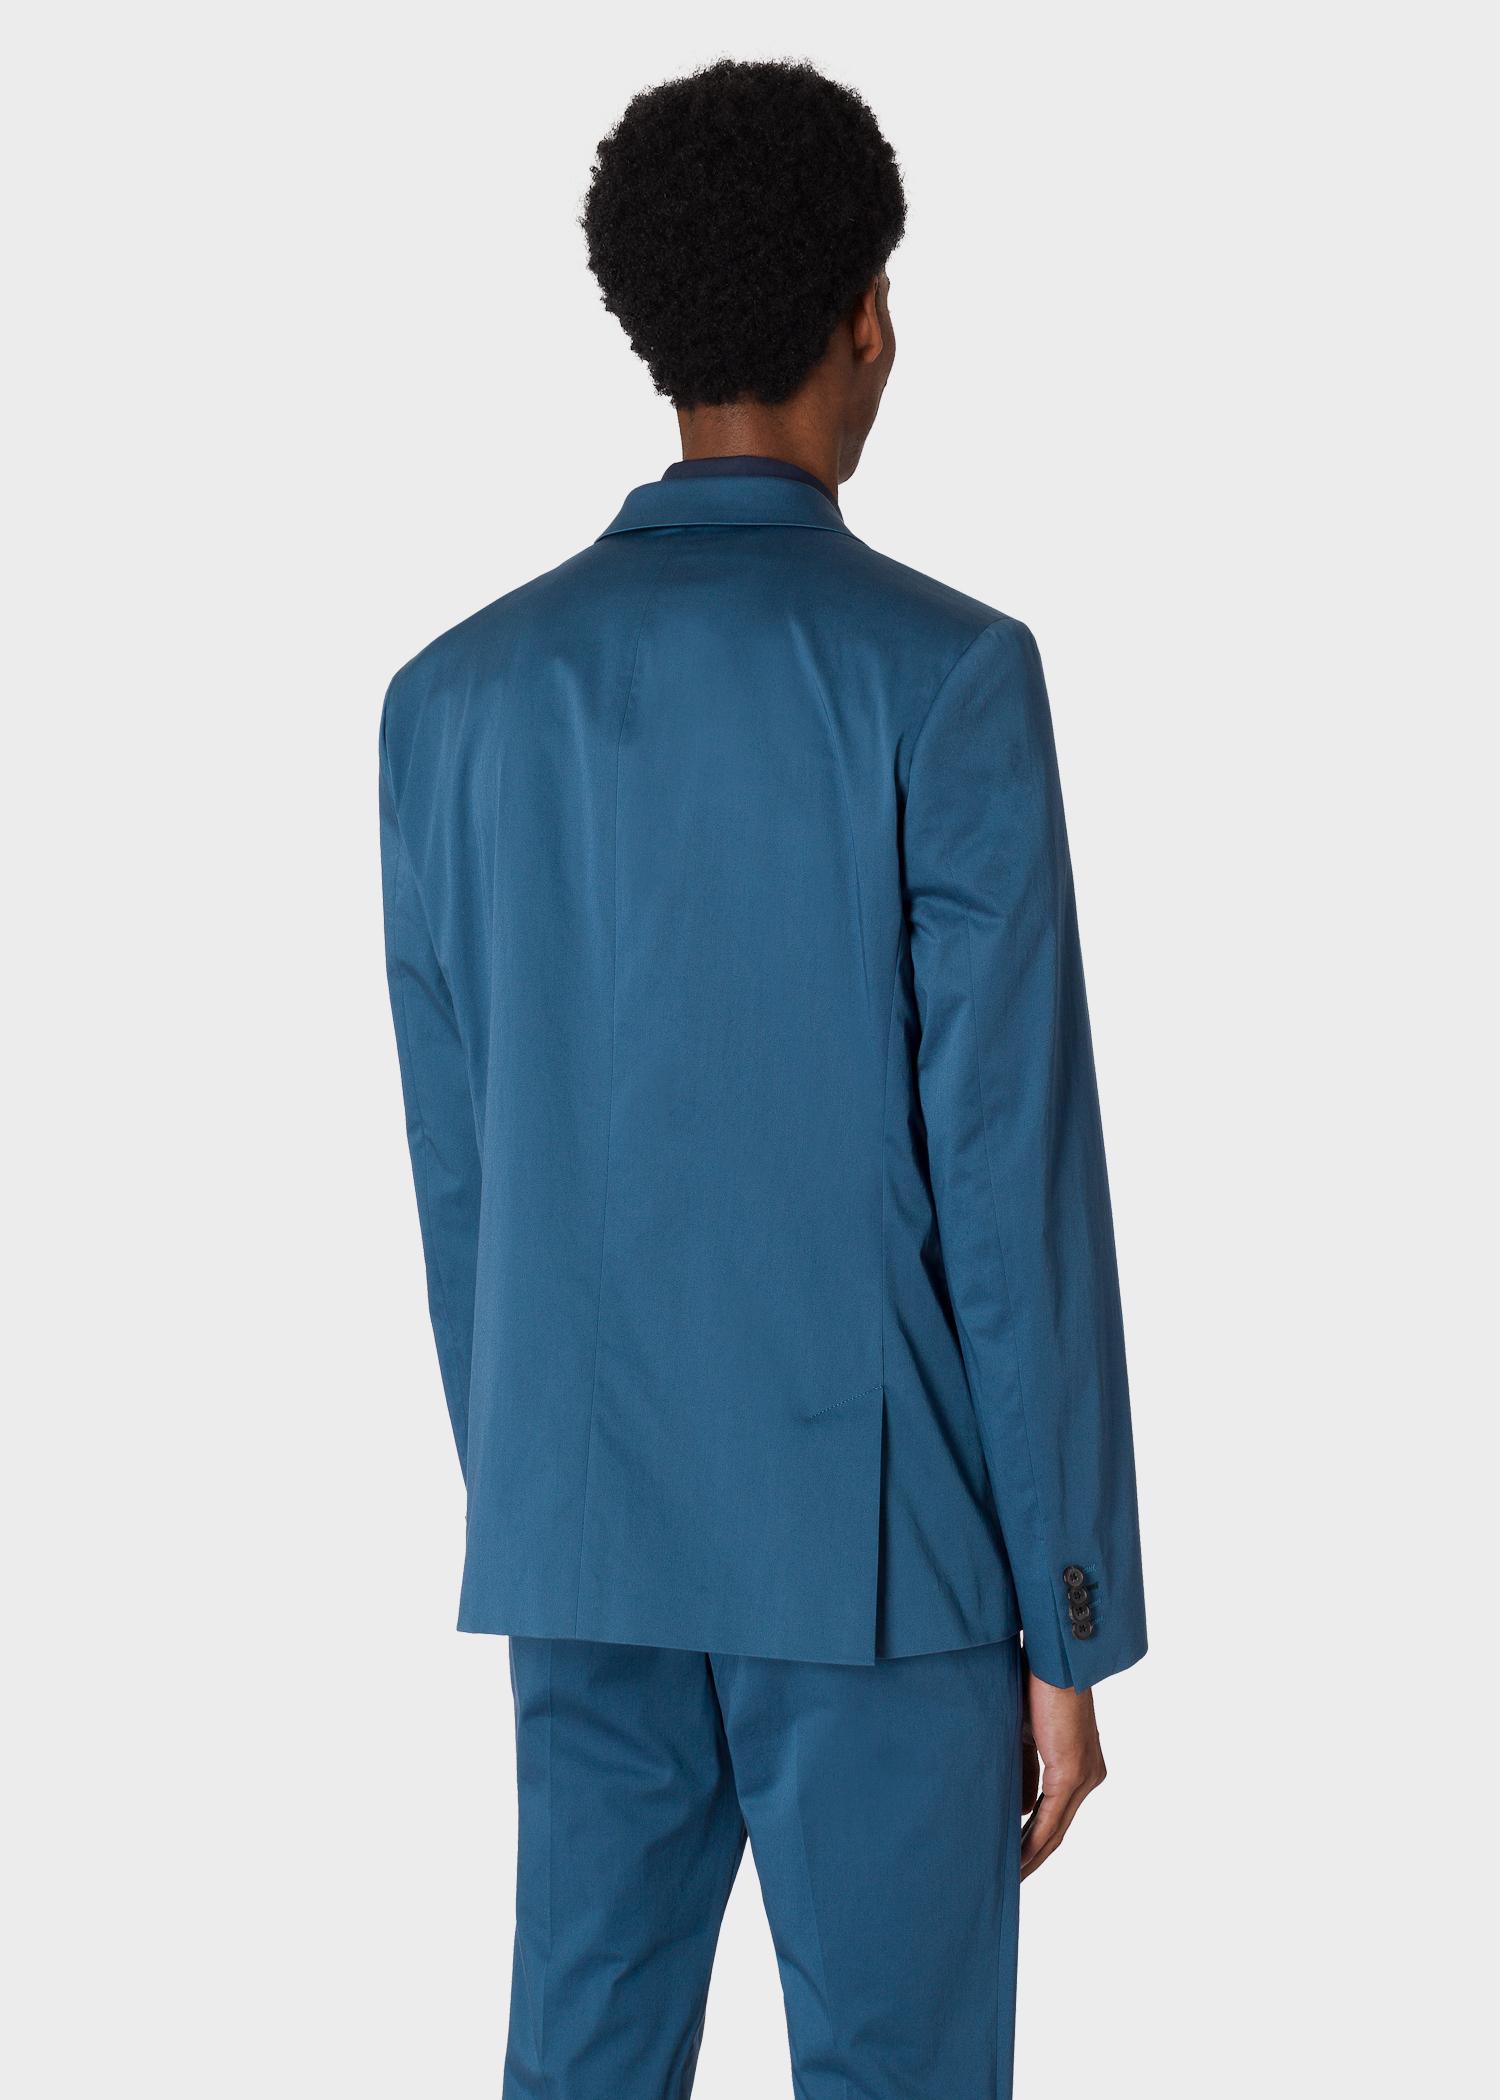 658a3dfd03 Men's Slim-Fit Slate Blue Stretch-Cotton Buggy-Lined Blazer